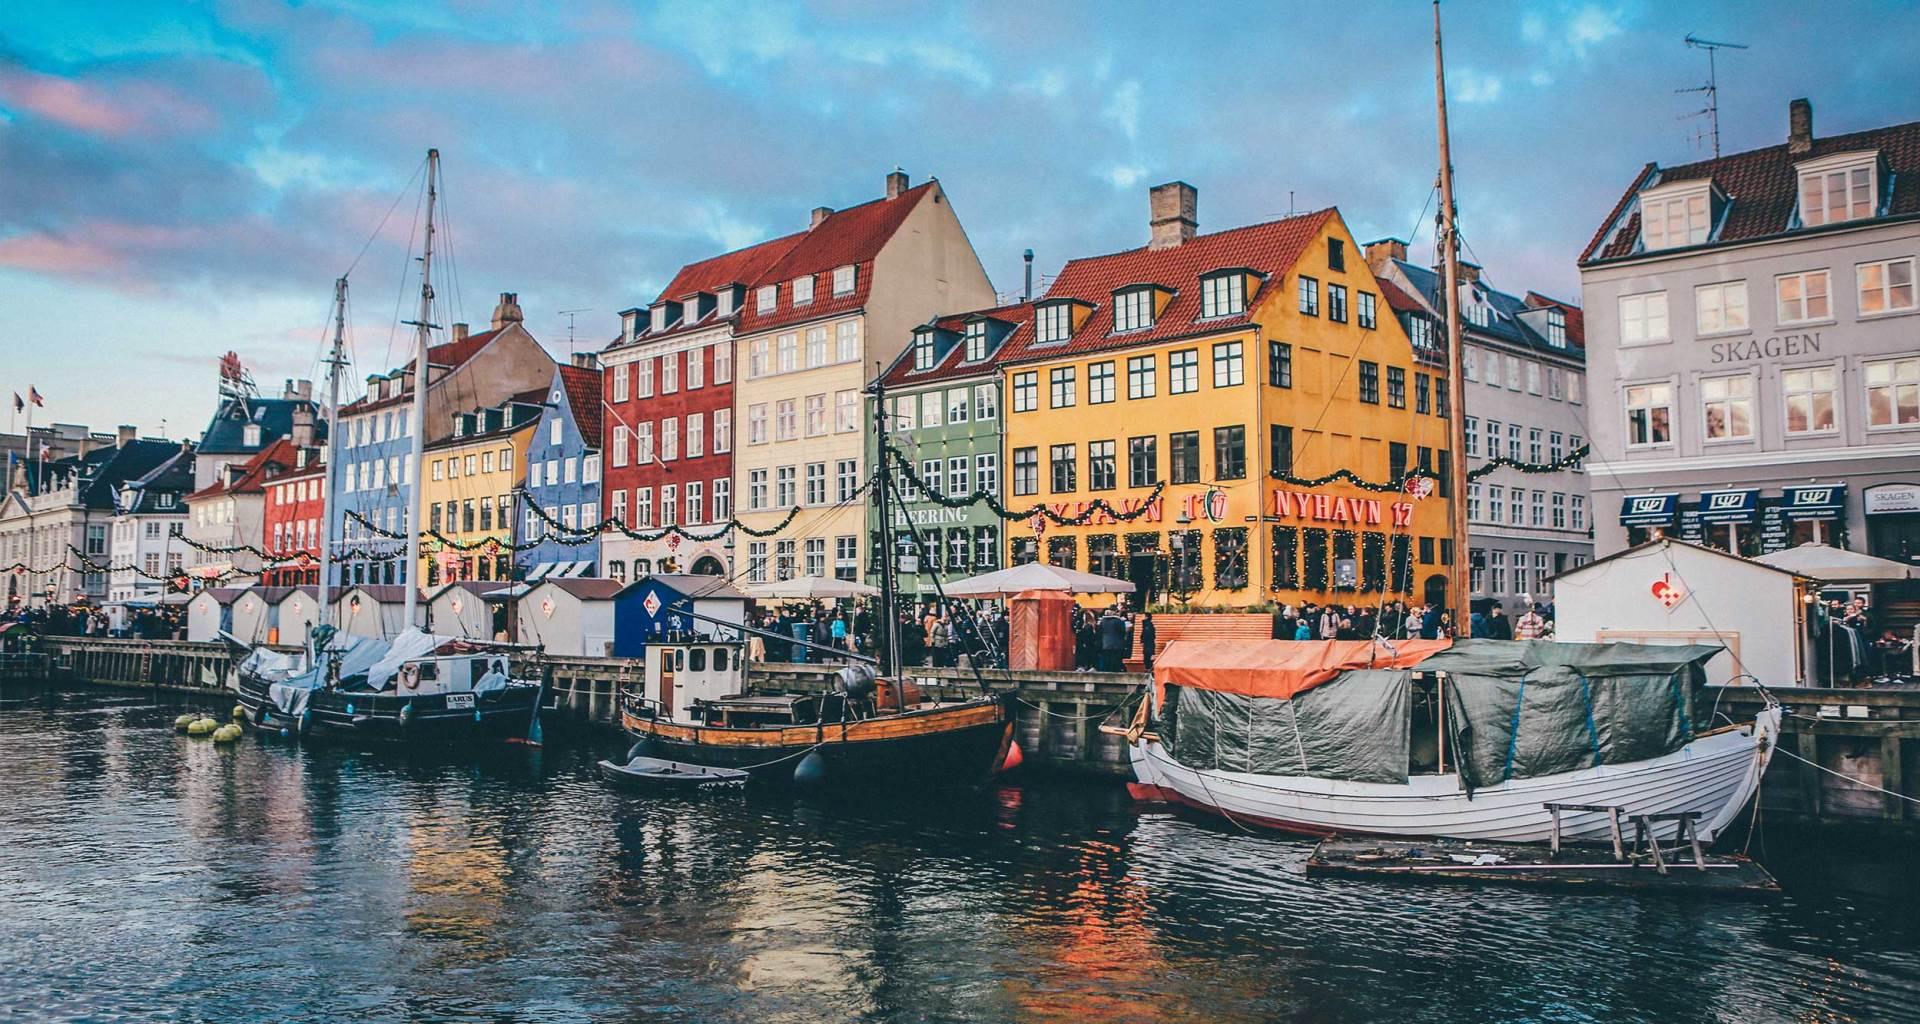 Colorful buildings in front of the water in Copenhagen, Denmark.